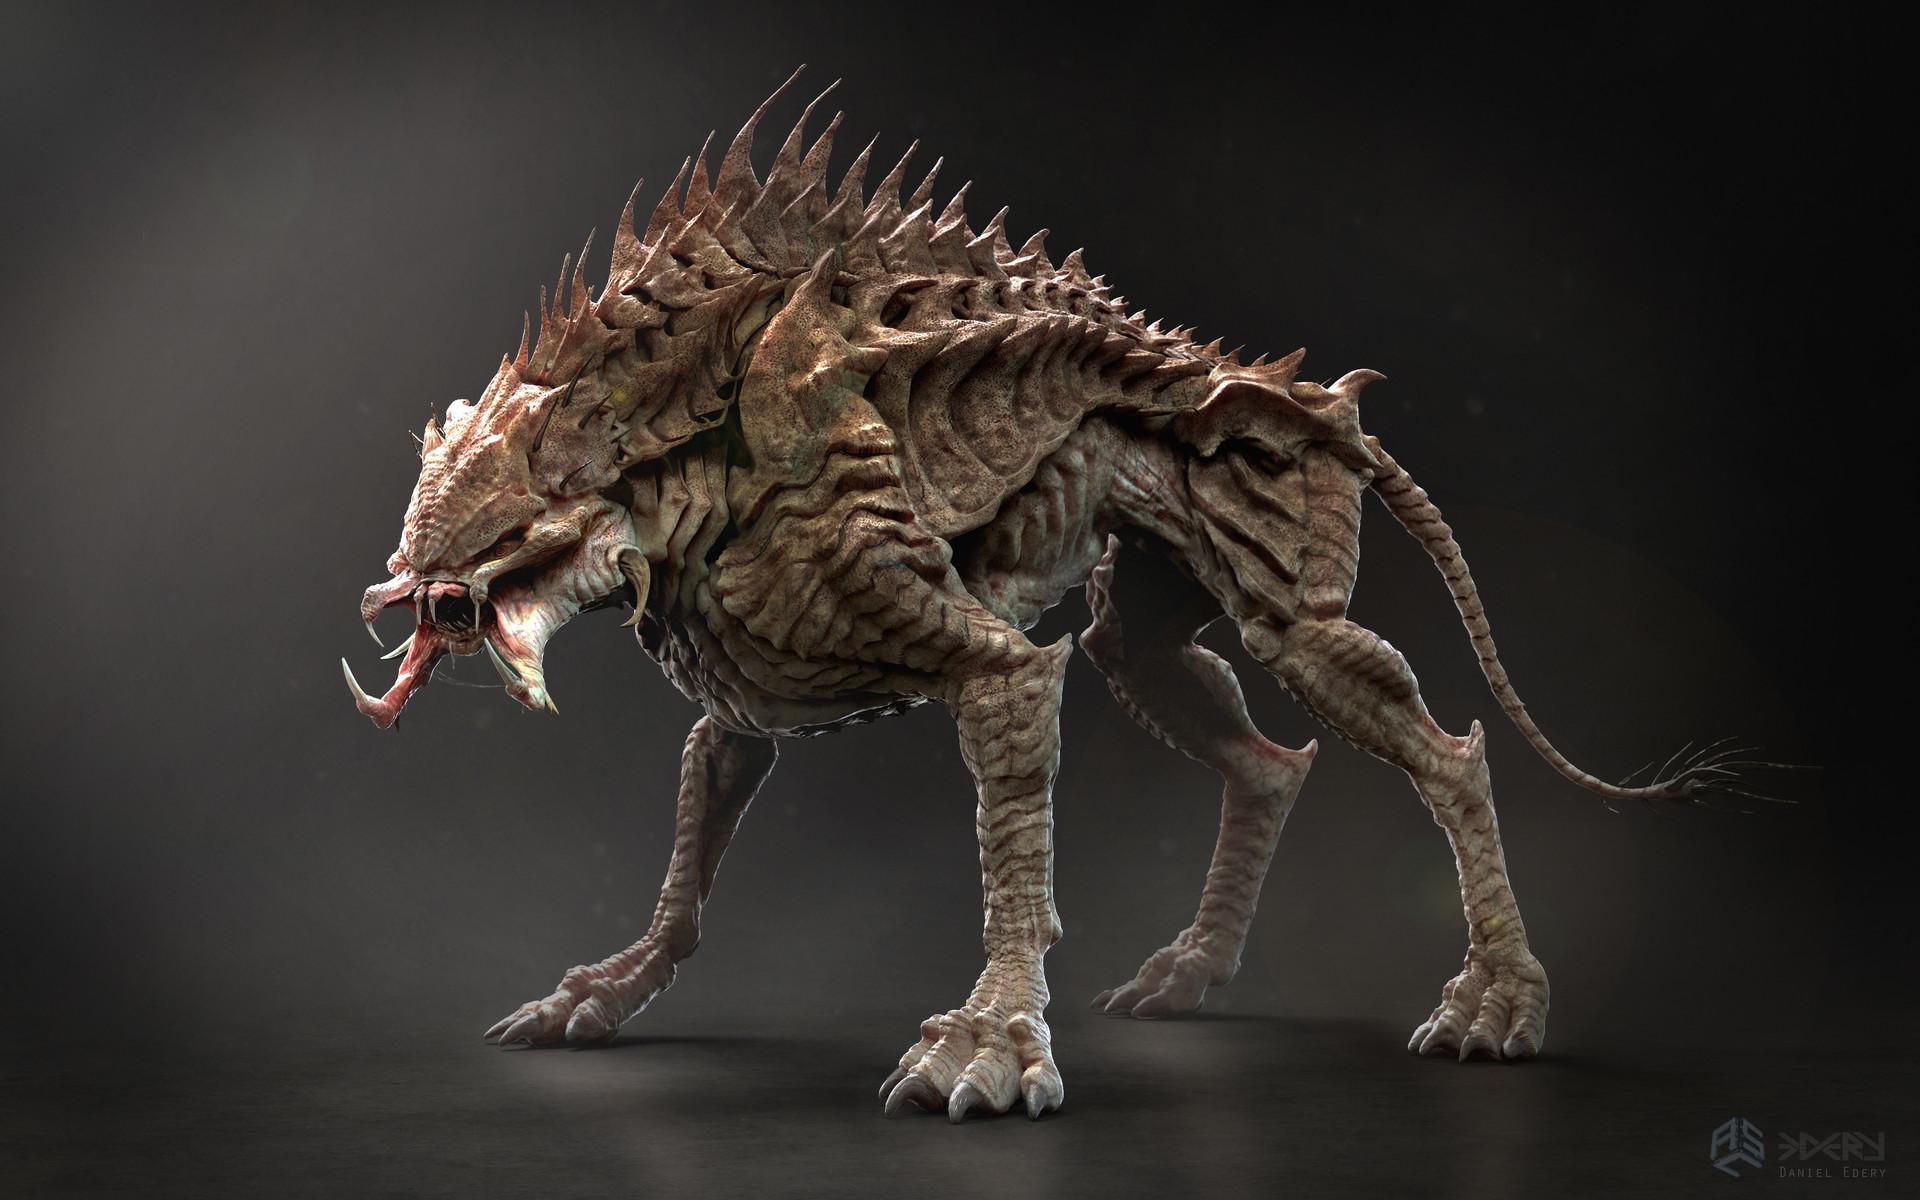 Daniel edery asc predator huntingdog v09 01 22 16